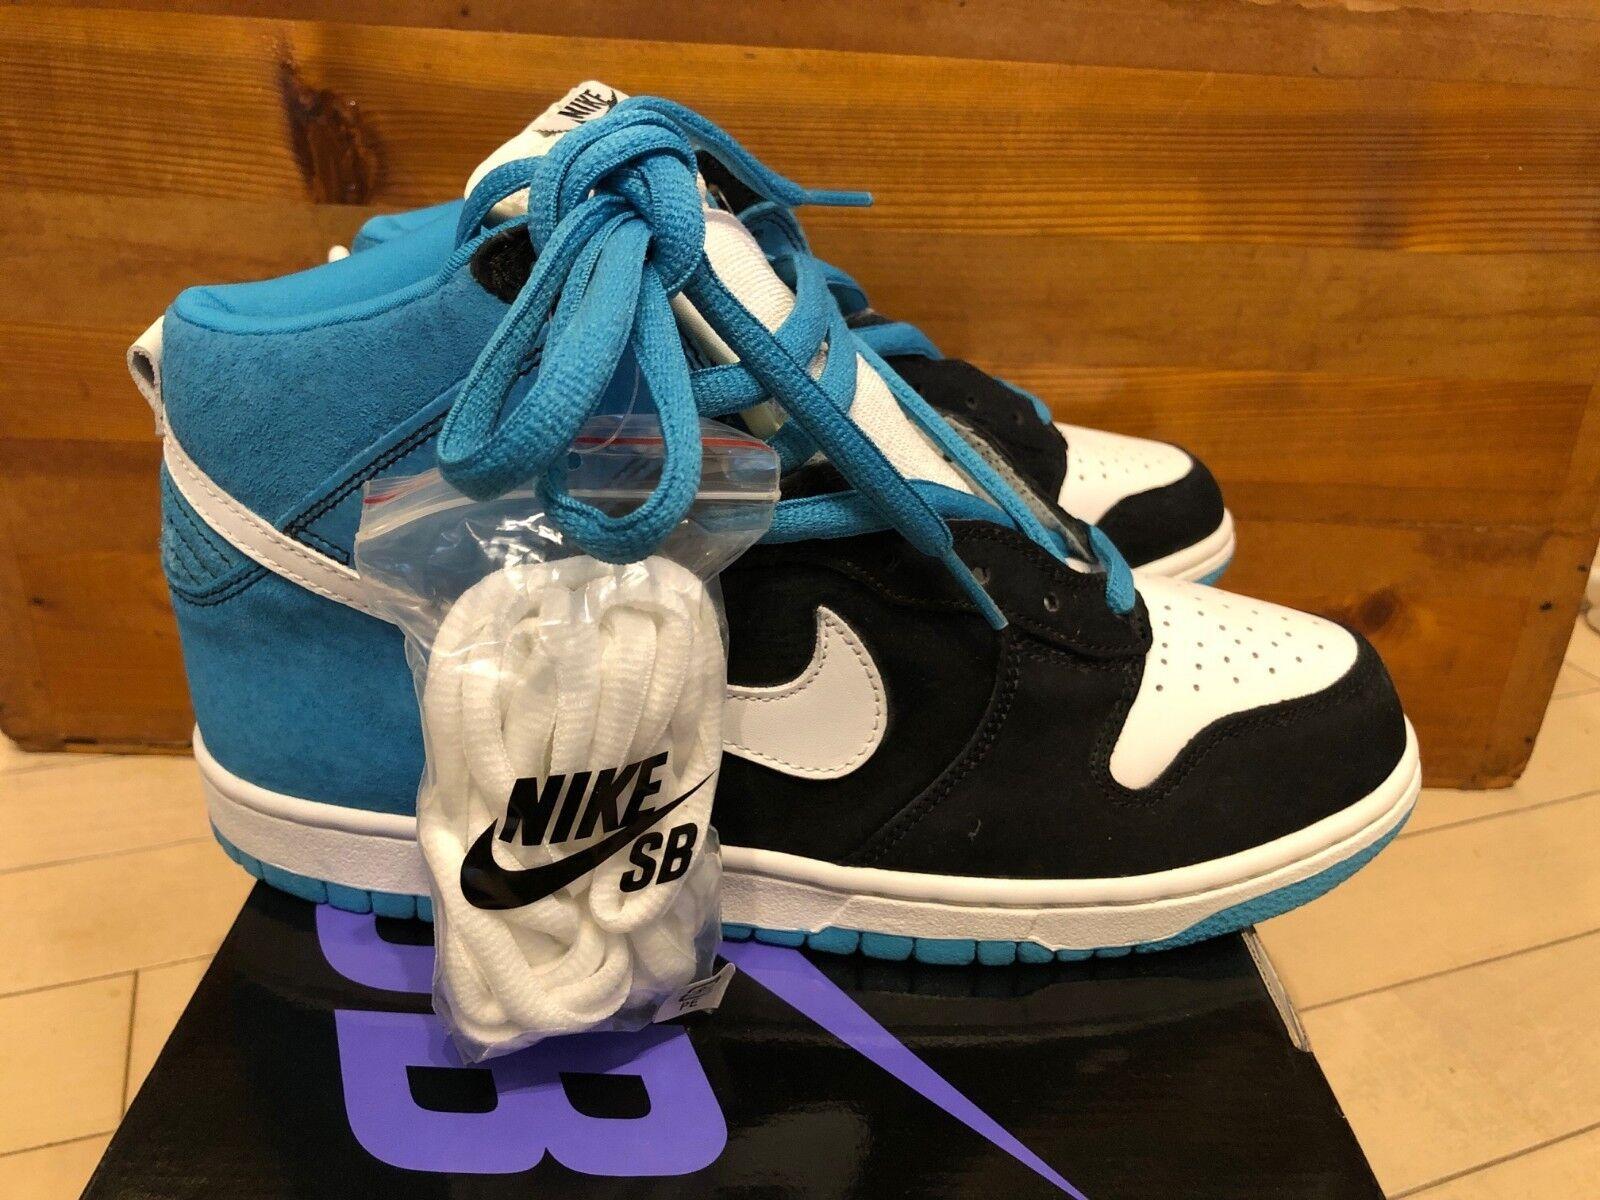 2006 Nike Dunk High Pro SB Send Help Black Reef White size 10